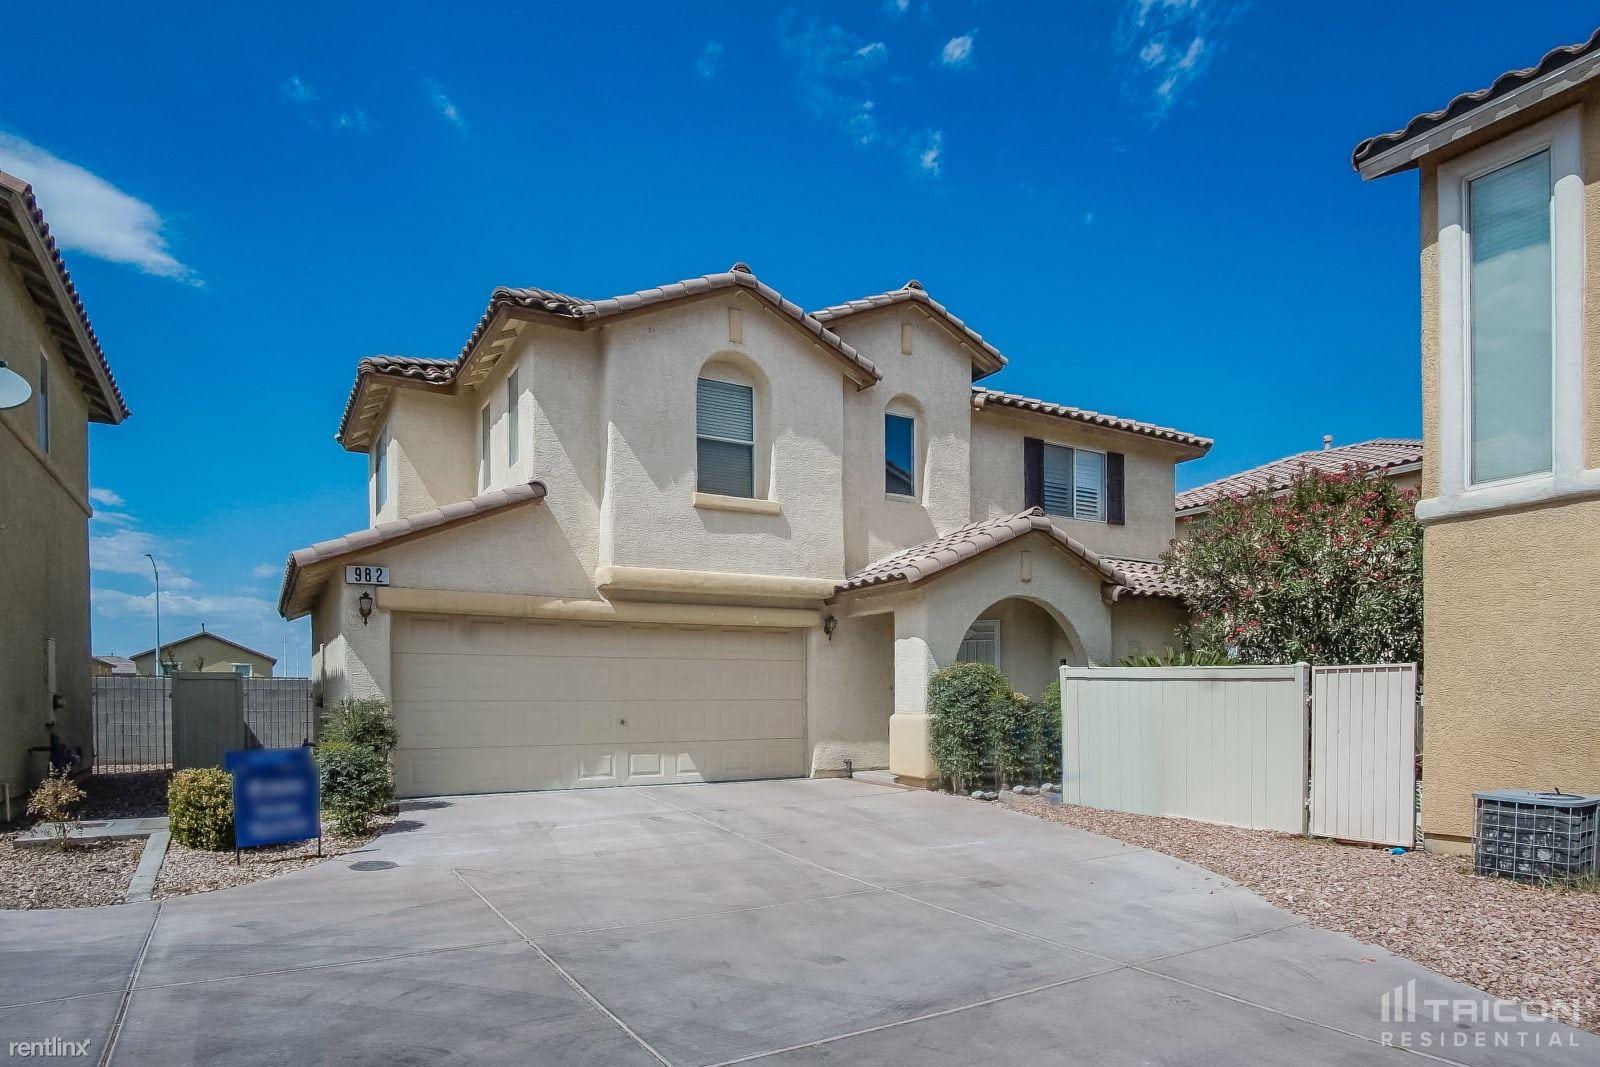 982 Valetta Flat Avenue, Las Vegas, NV - 1,999 USD/ month